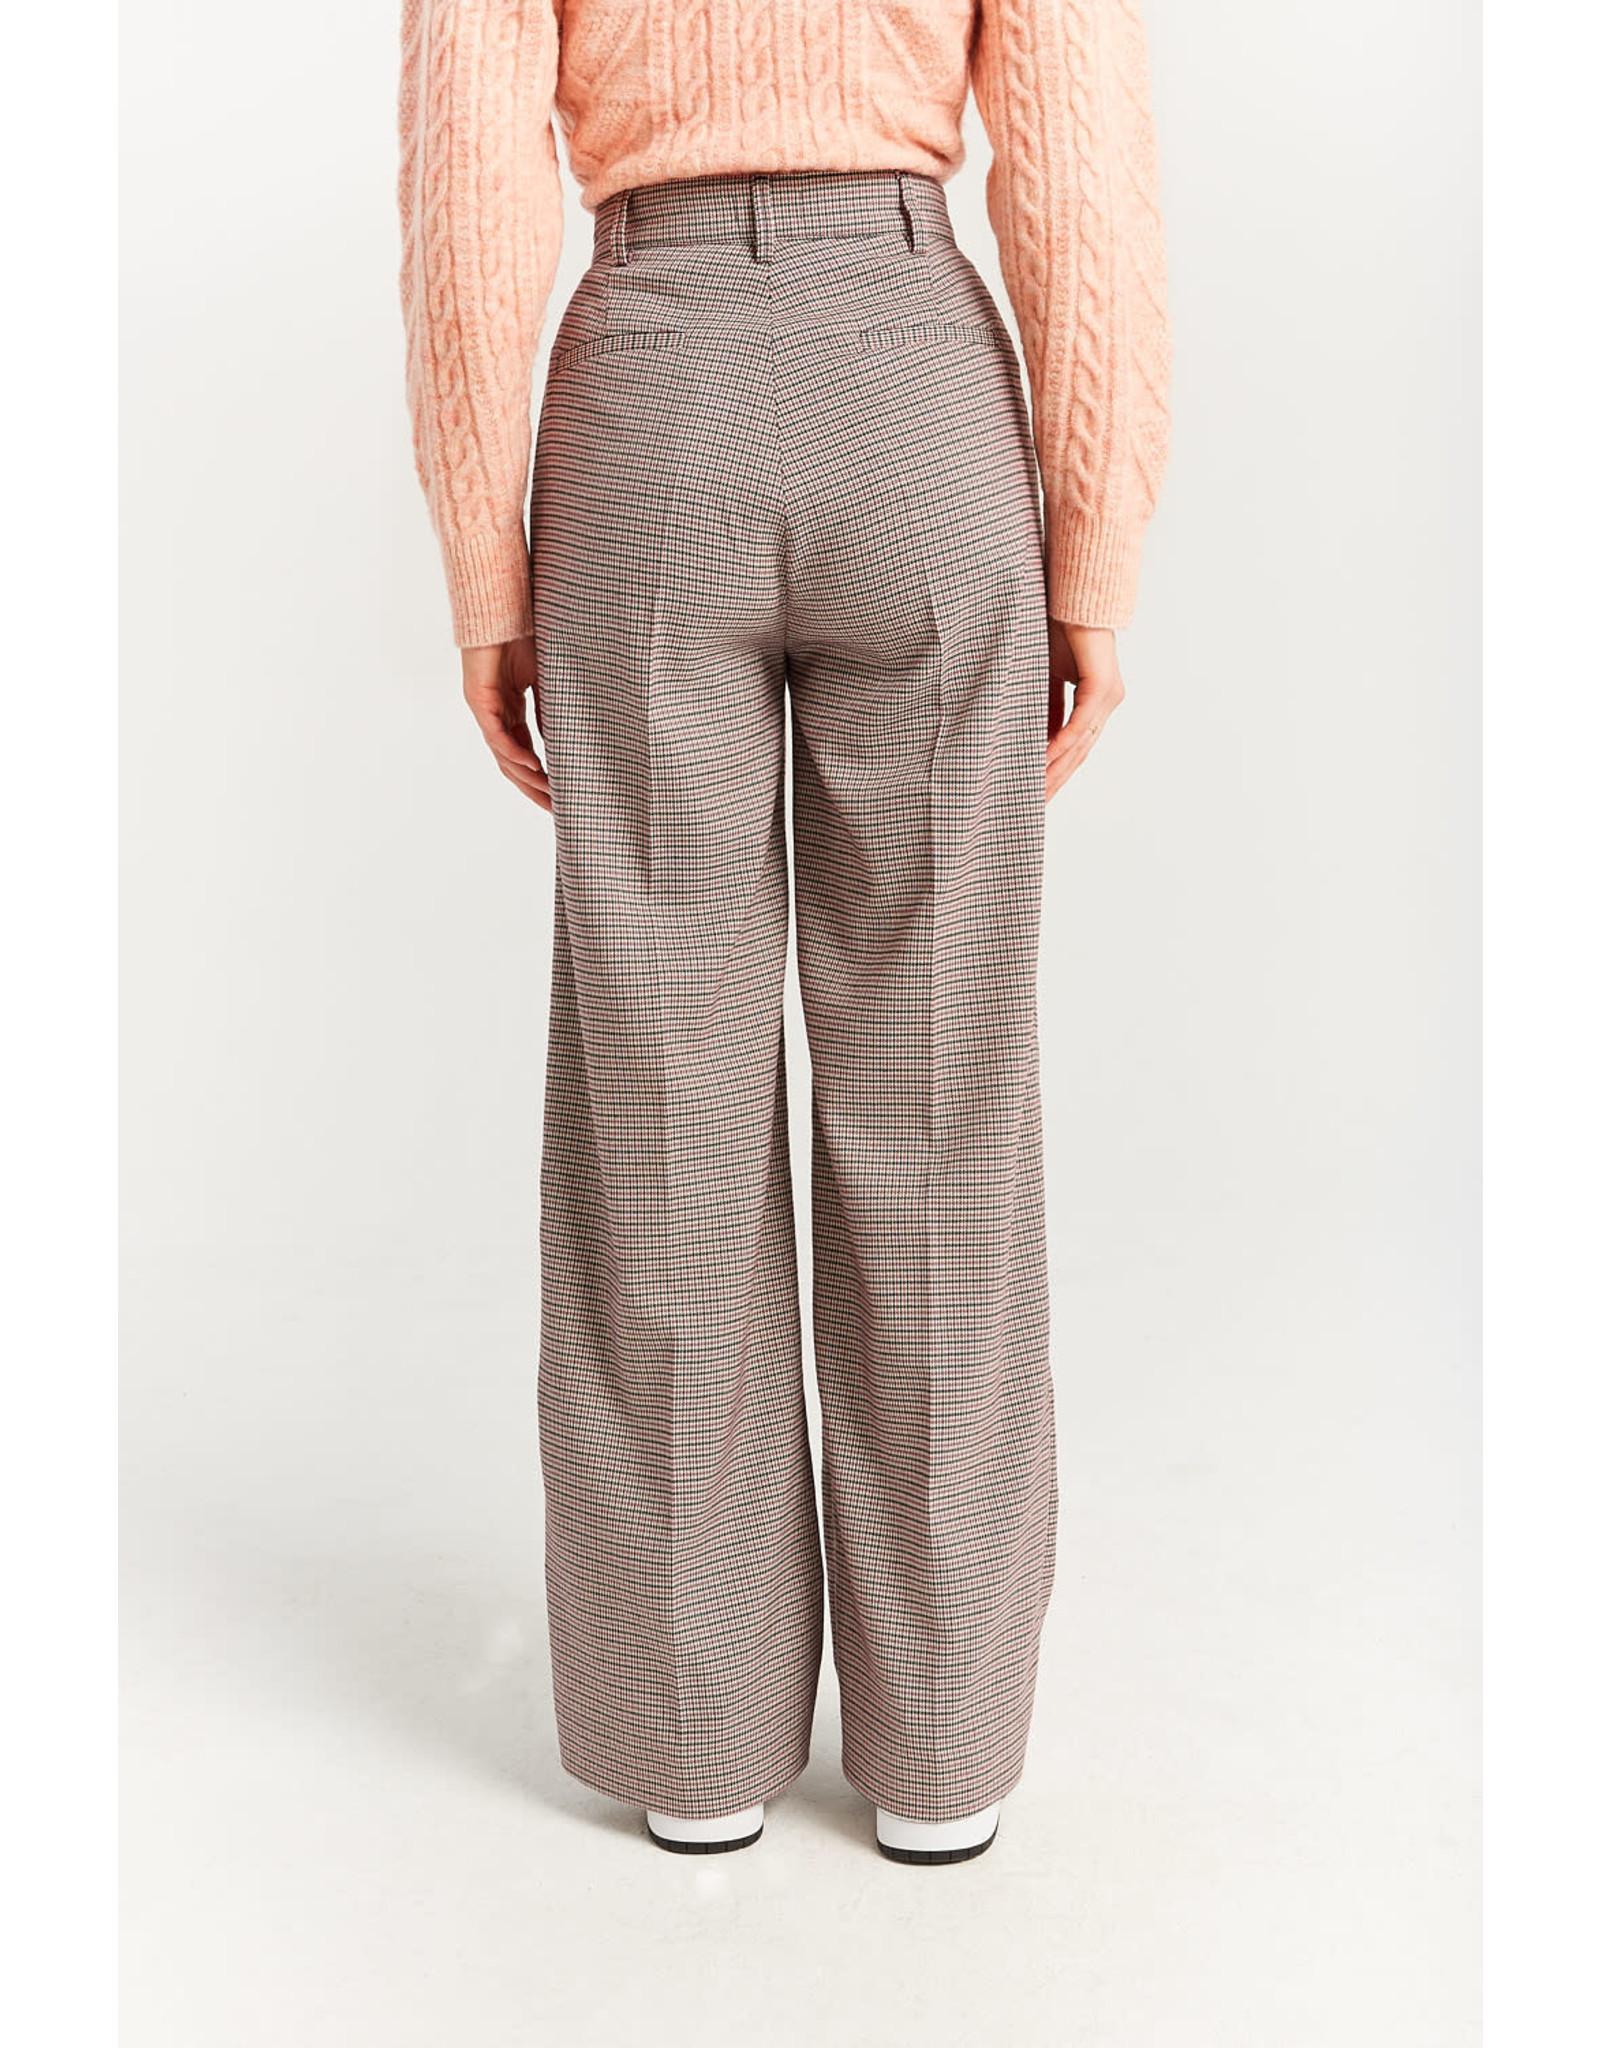 INDEE FW21 Kiev trousers rosewood